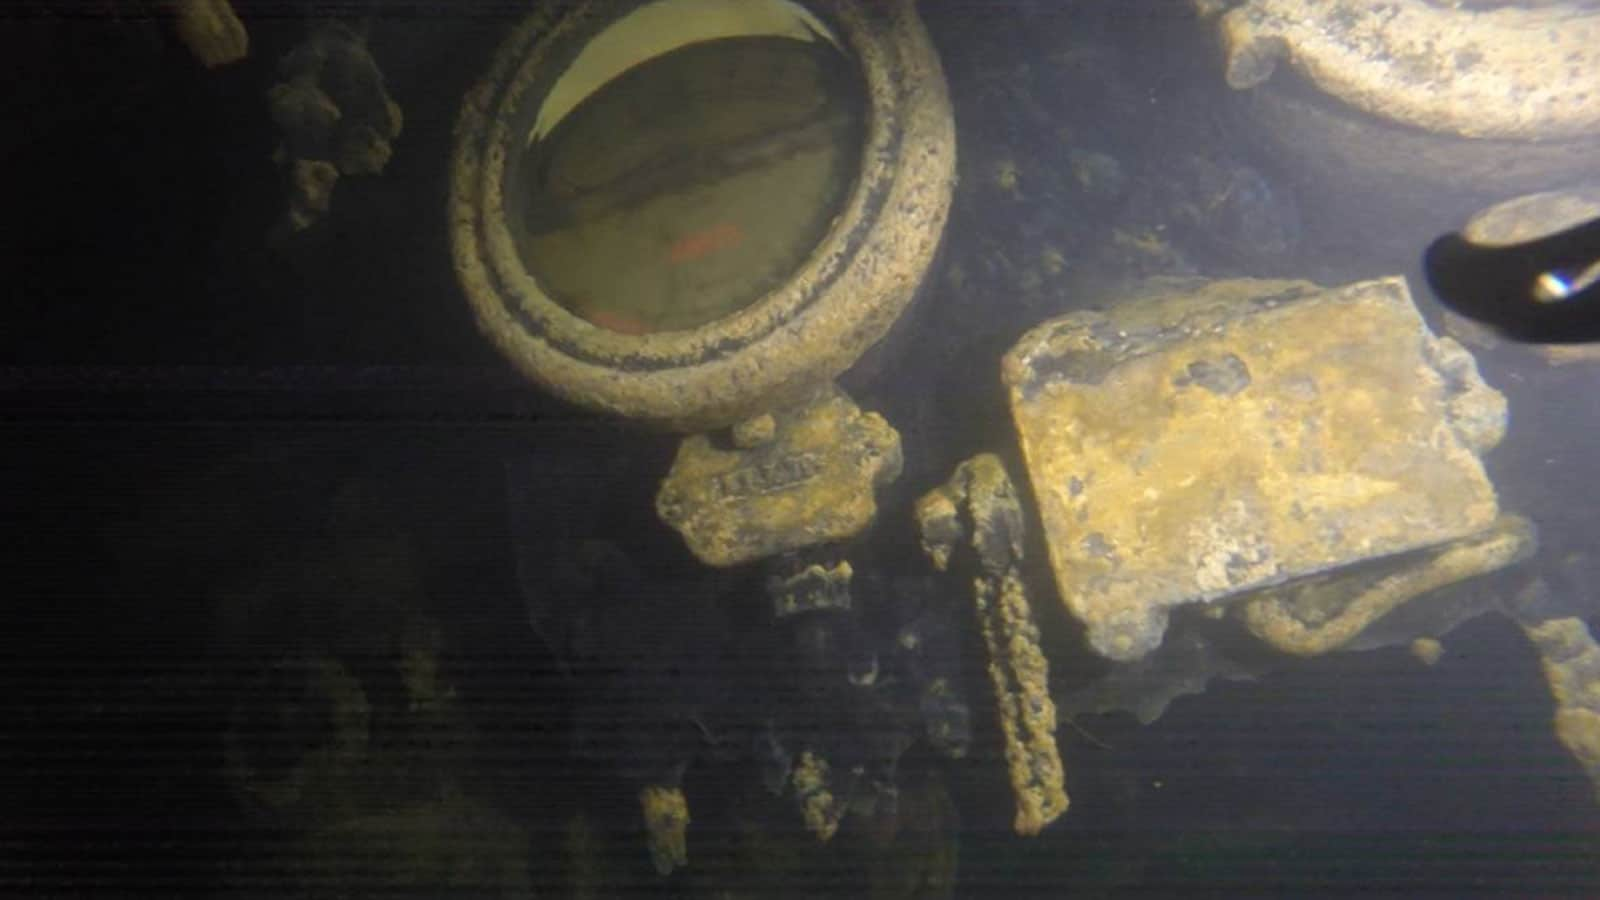 AE2 Australian Submarine Wreck in Marmara